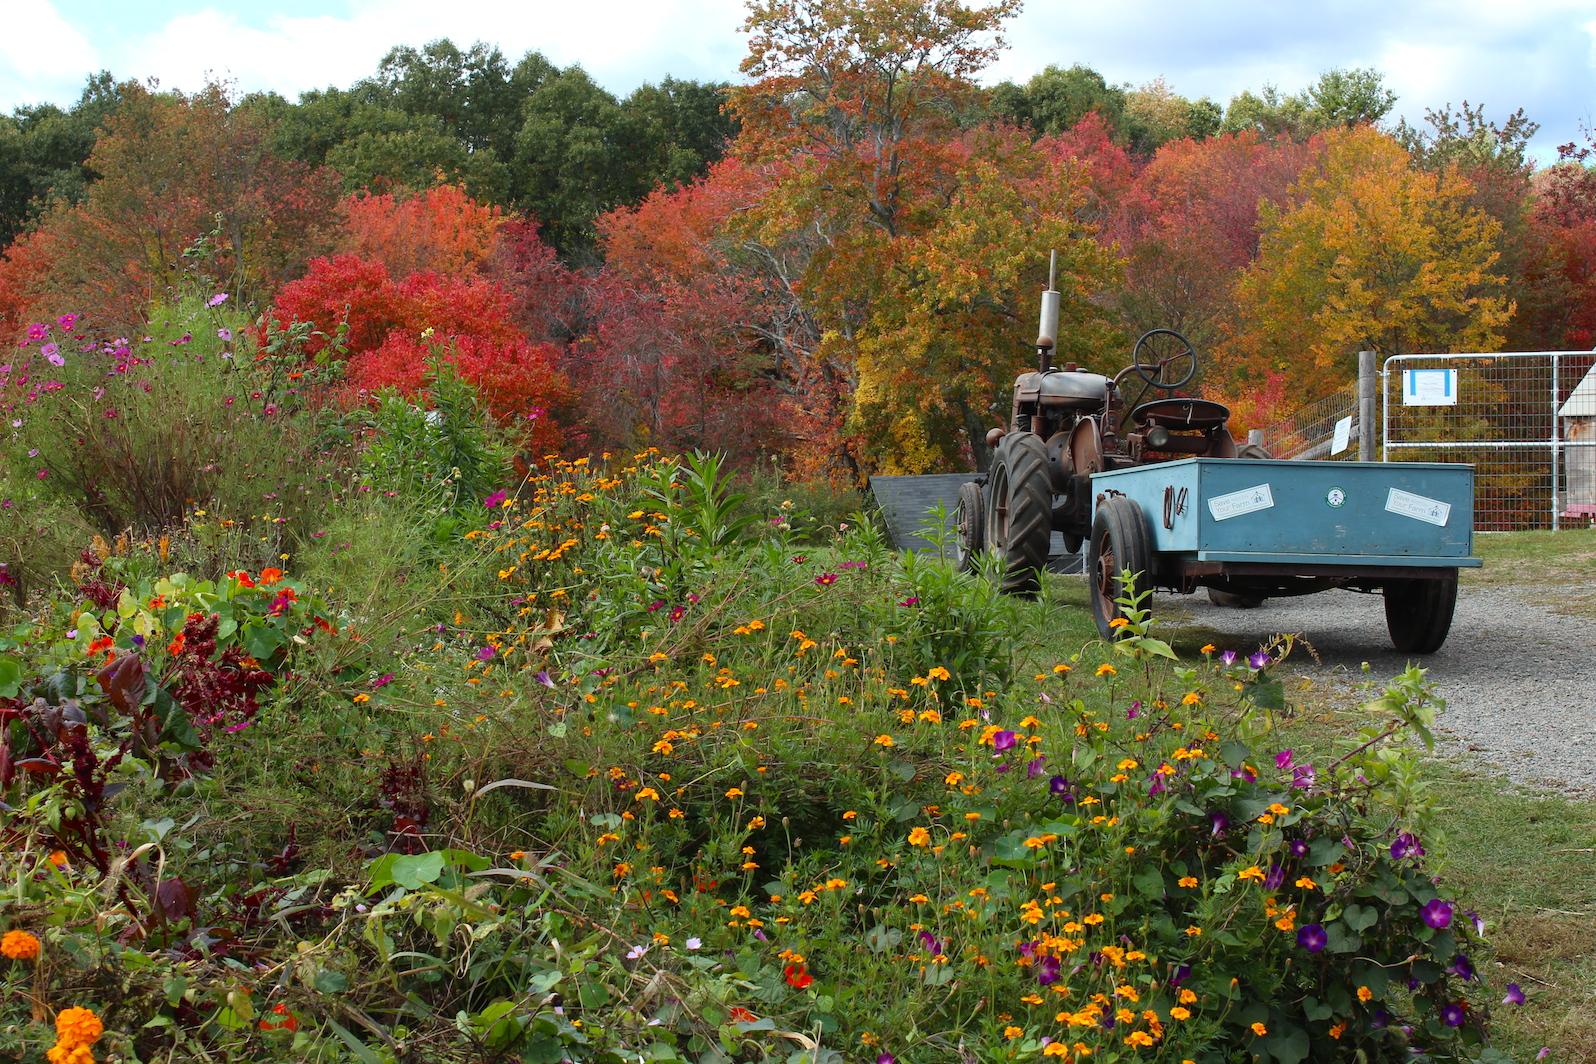 Farmall tractor in the fall (Rebekah Carter 2015)